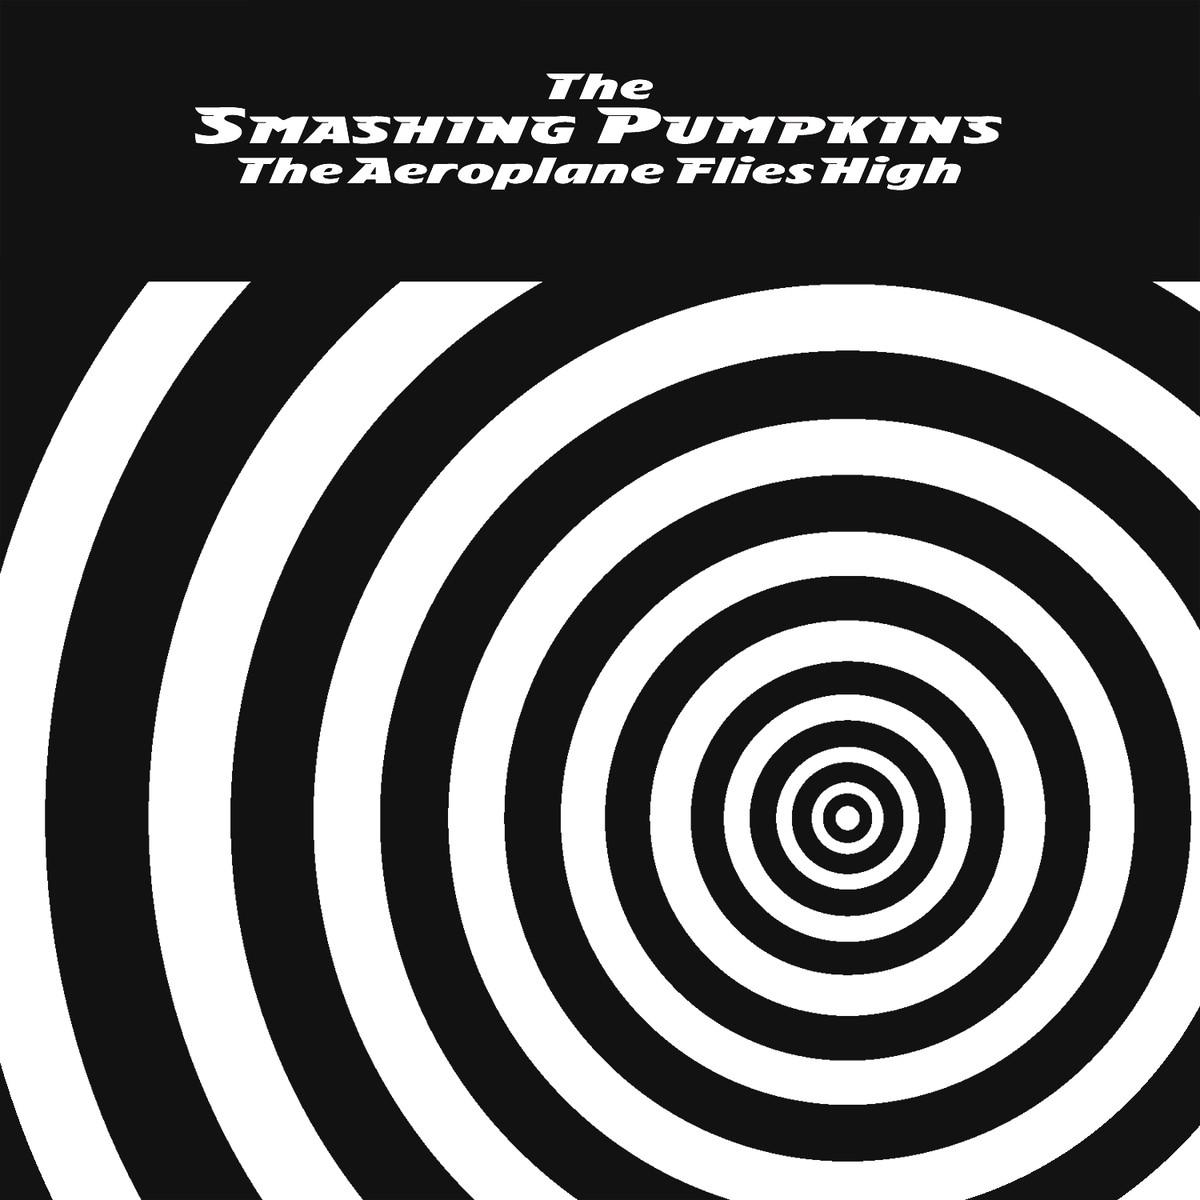 Smashing Pumpkins - The Aeroplane Flies High